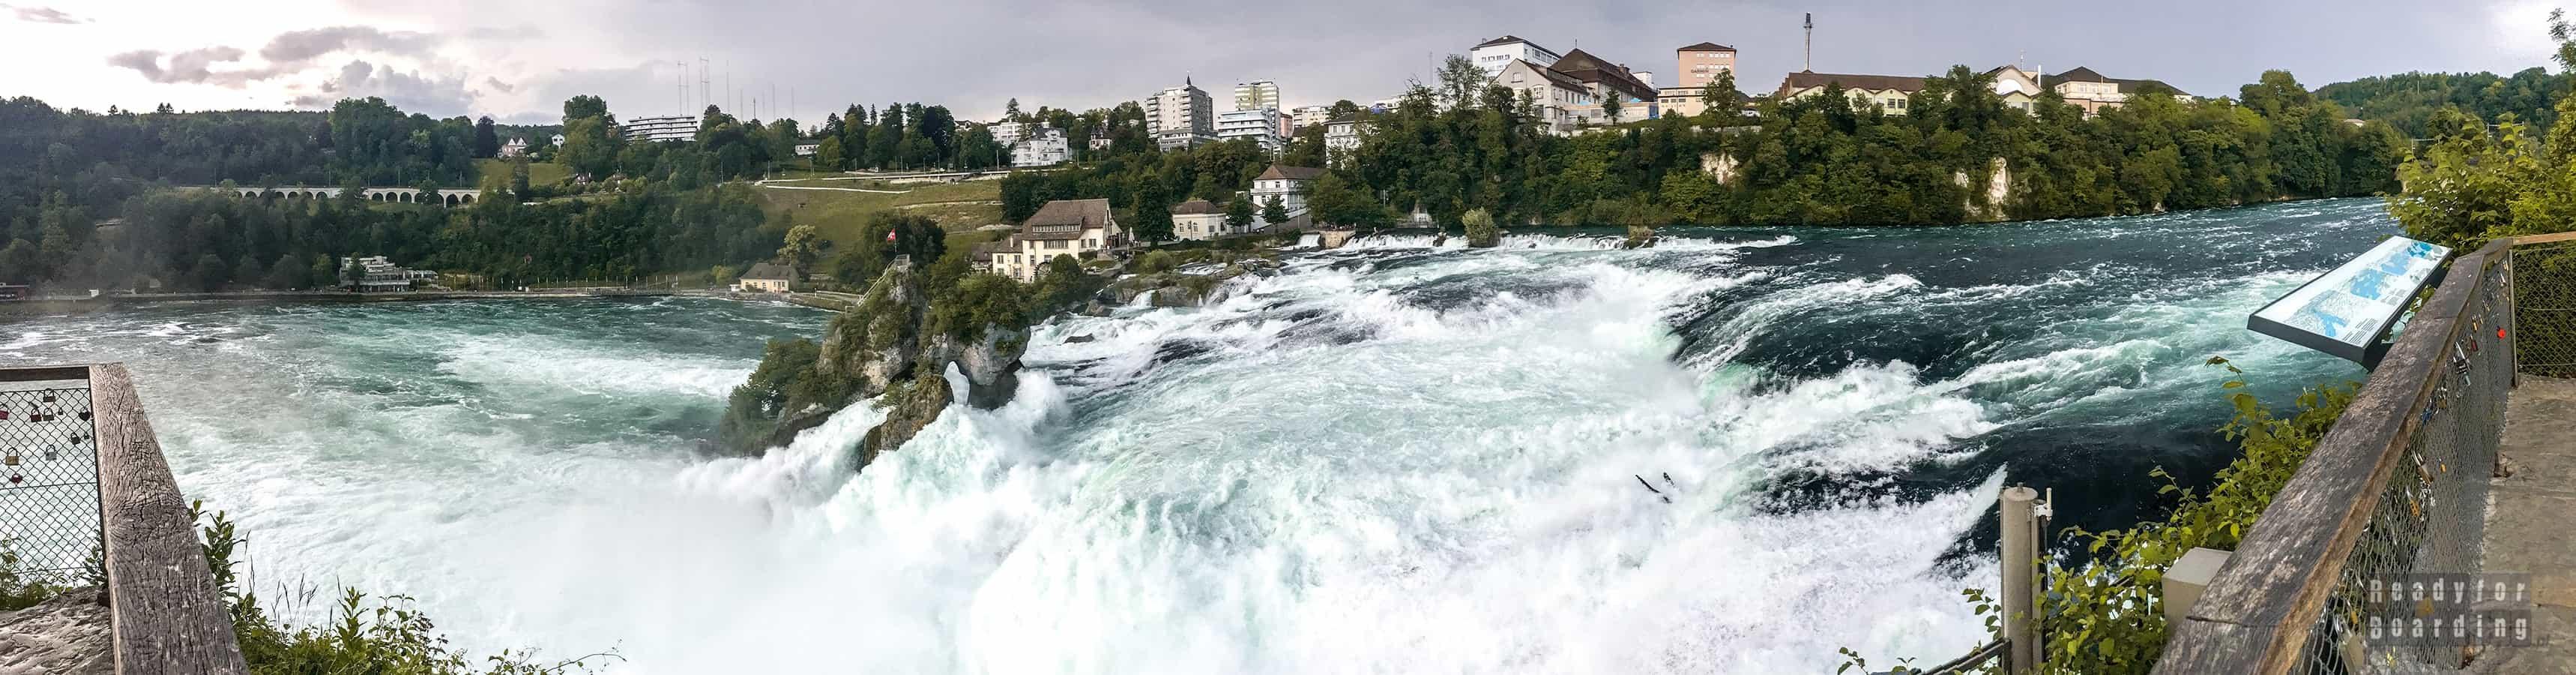 Panorama: Szafuza - Szwajcaria